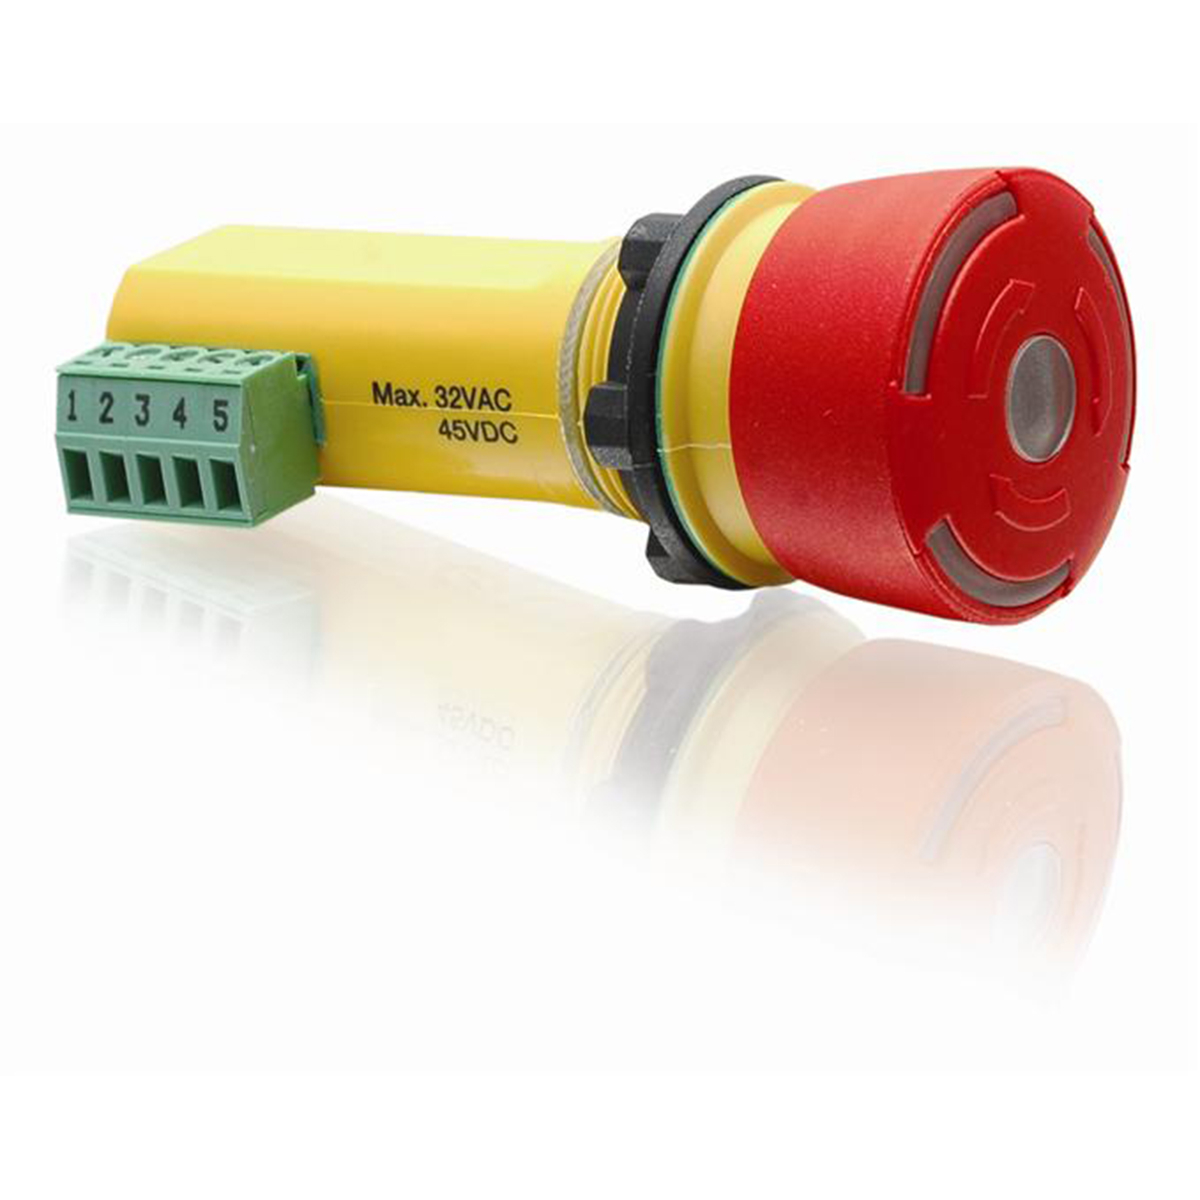 ABB 2TLA030054R0000 Emergency Stop Button